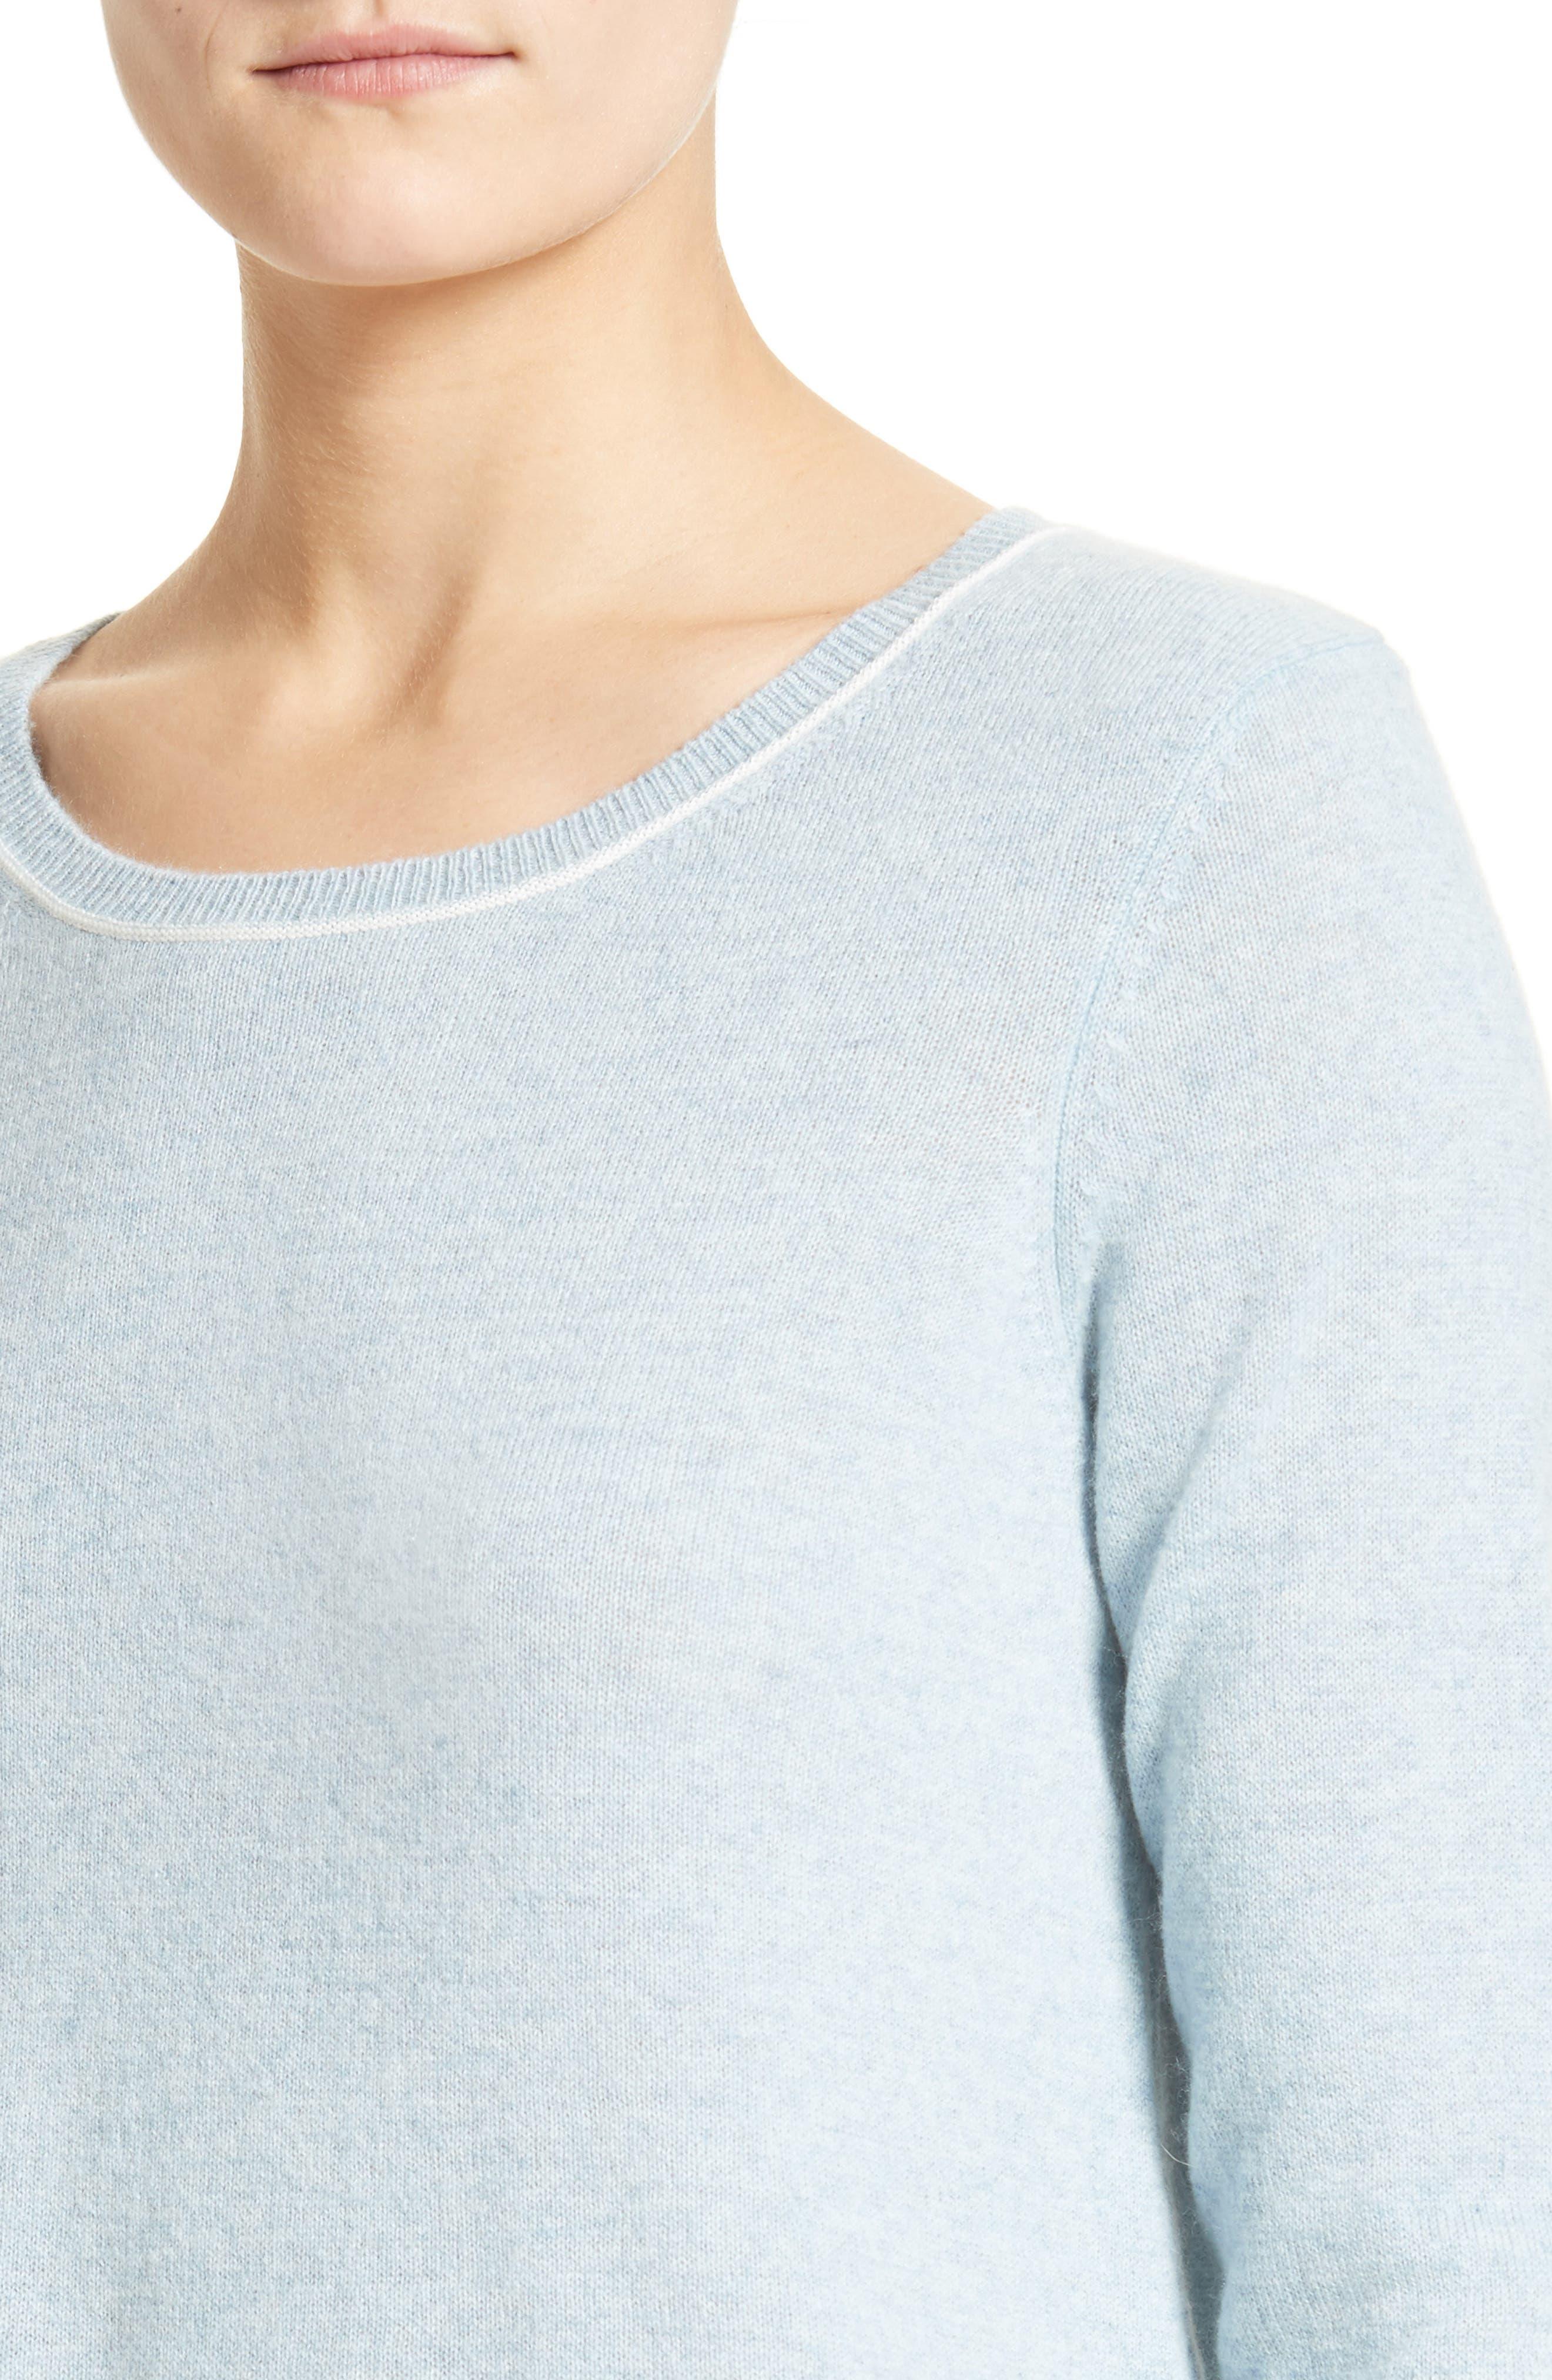 Tambrel H Asymmetrical Hem Cashmere Sweater,                             Alternate thumbnail 4, color,                             400